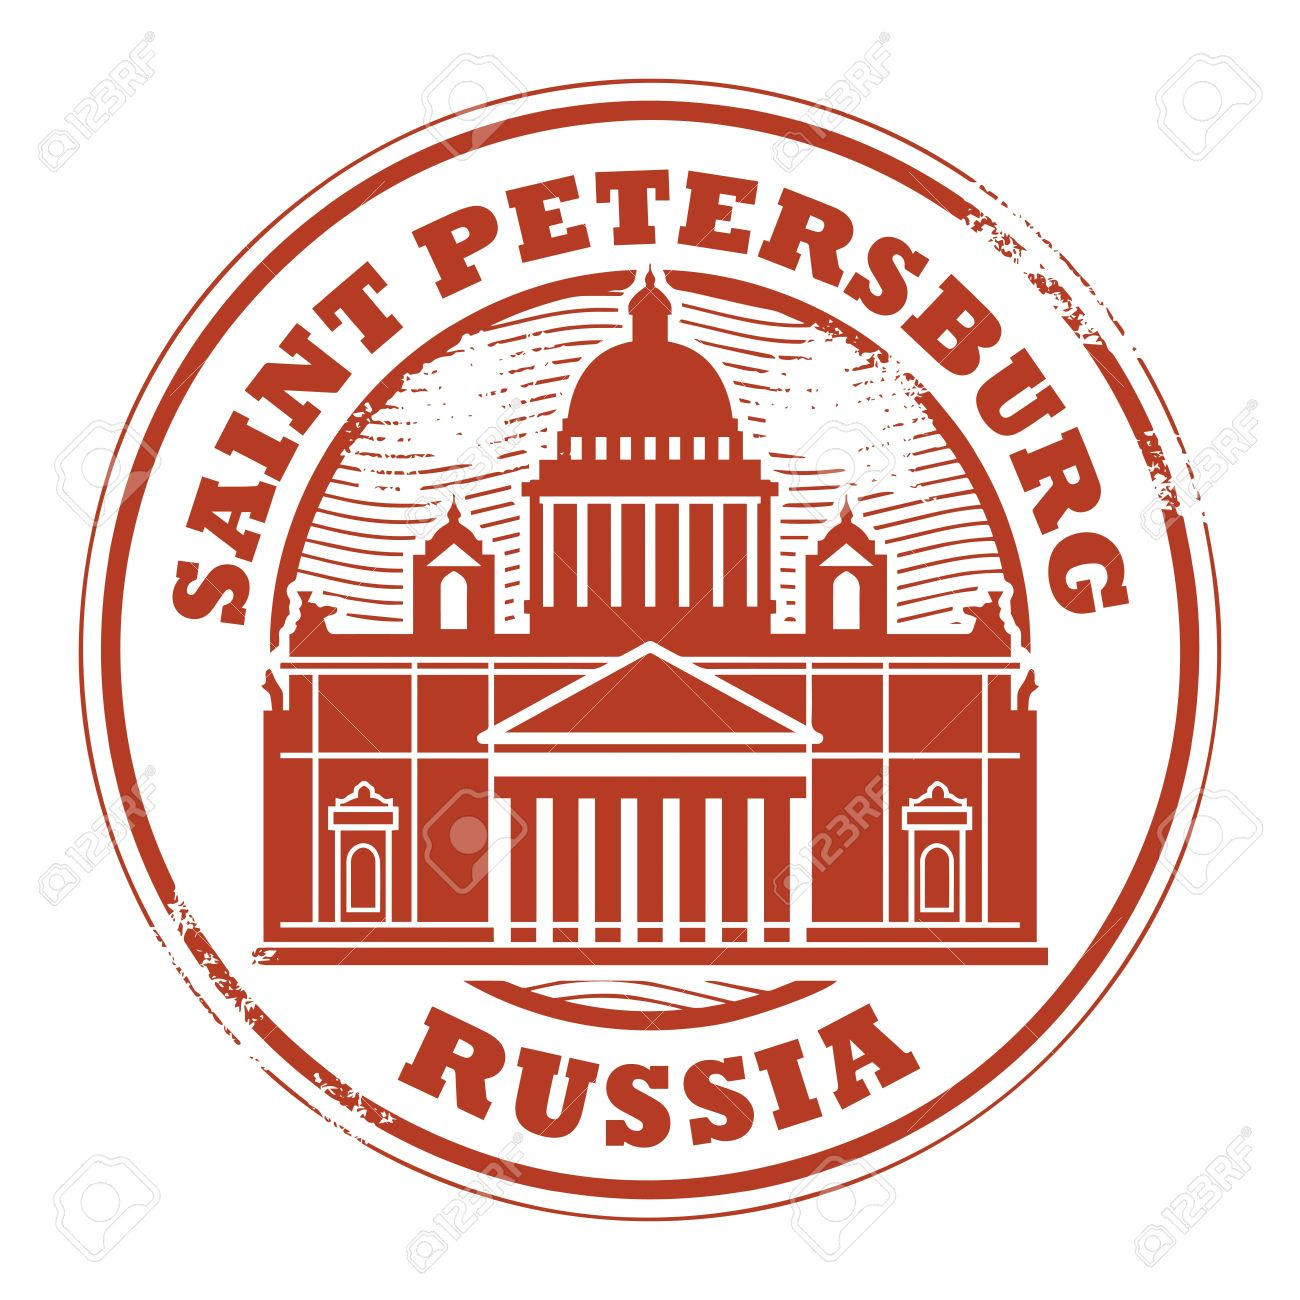 Saint Petersburg clipart #10, Download drawings